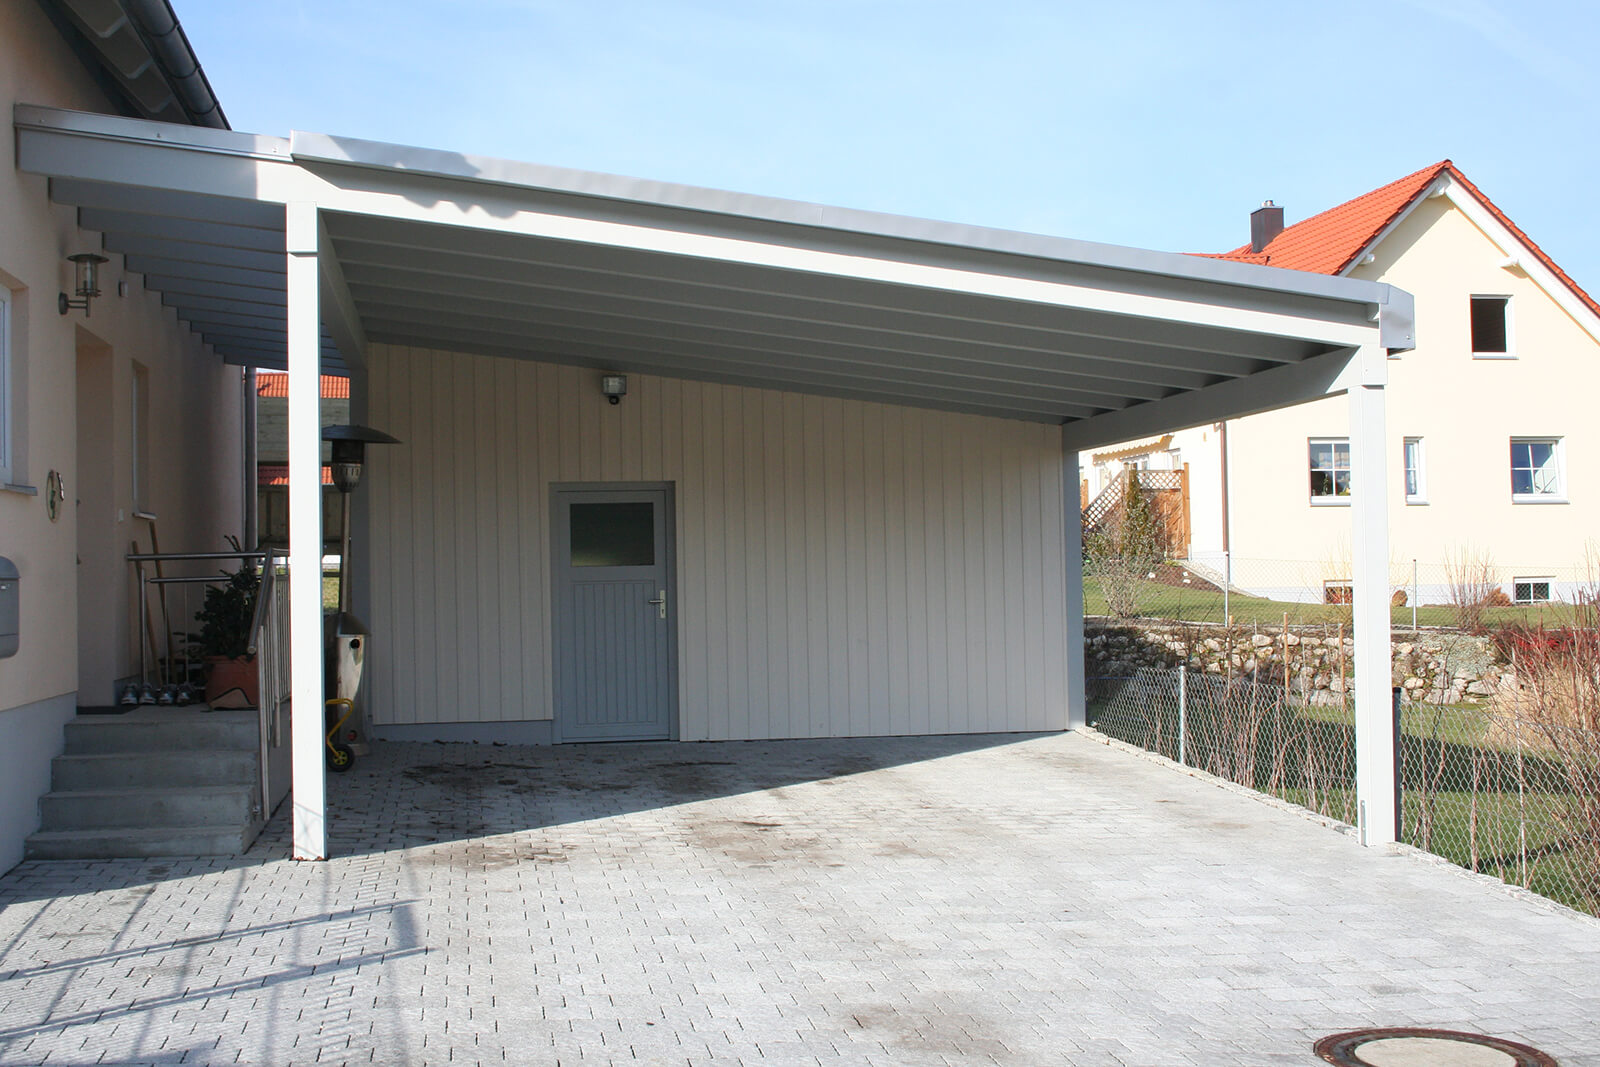 holzbau carport